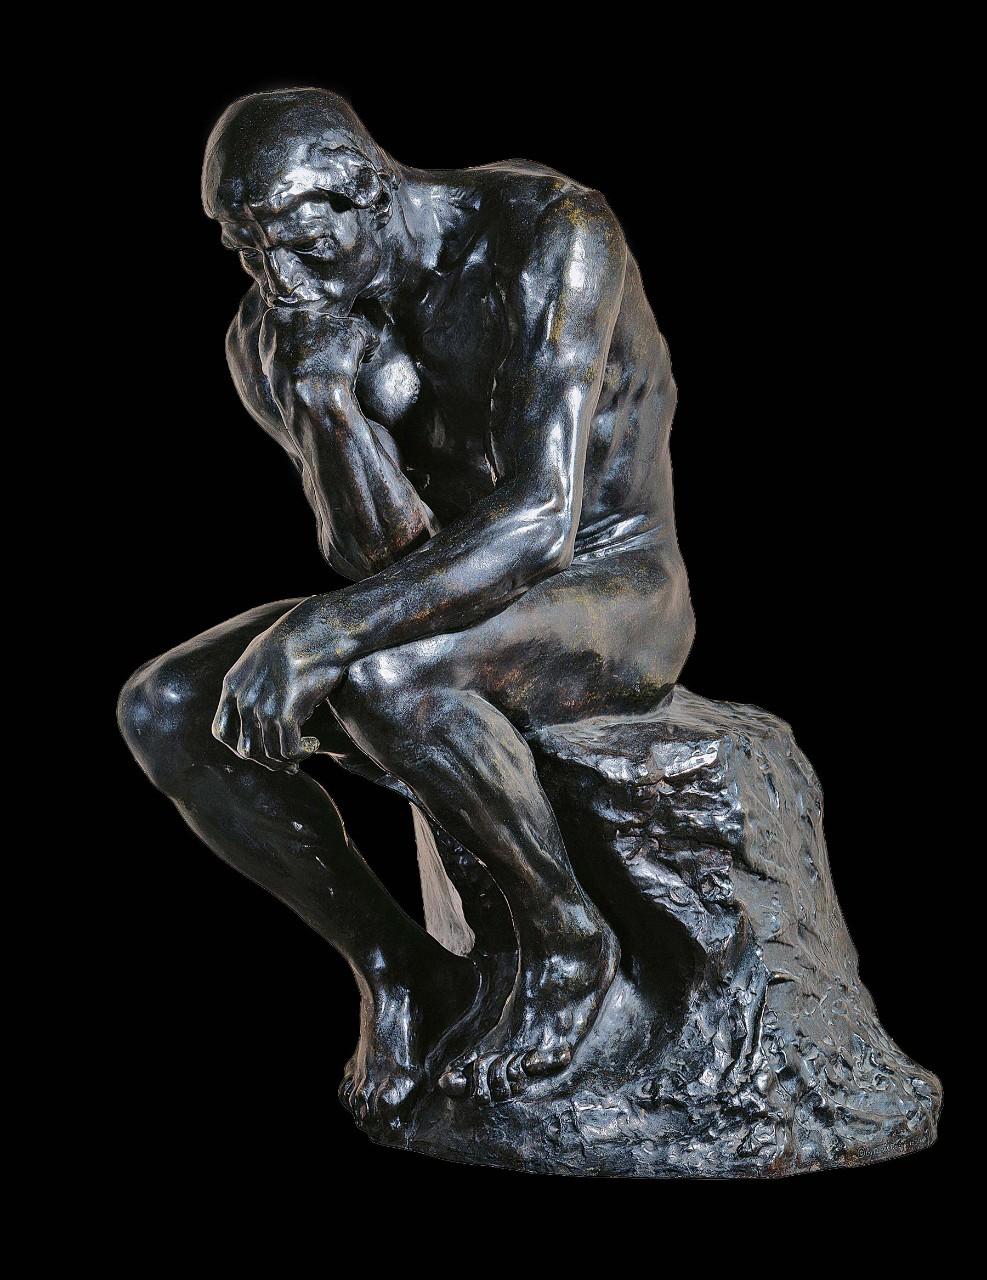 Le Penseur De Rodin Dessin : penseur, rodin, dessin, Auguste, Rodin,, Penseur